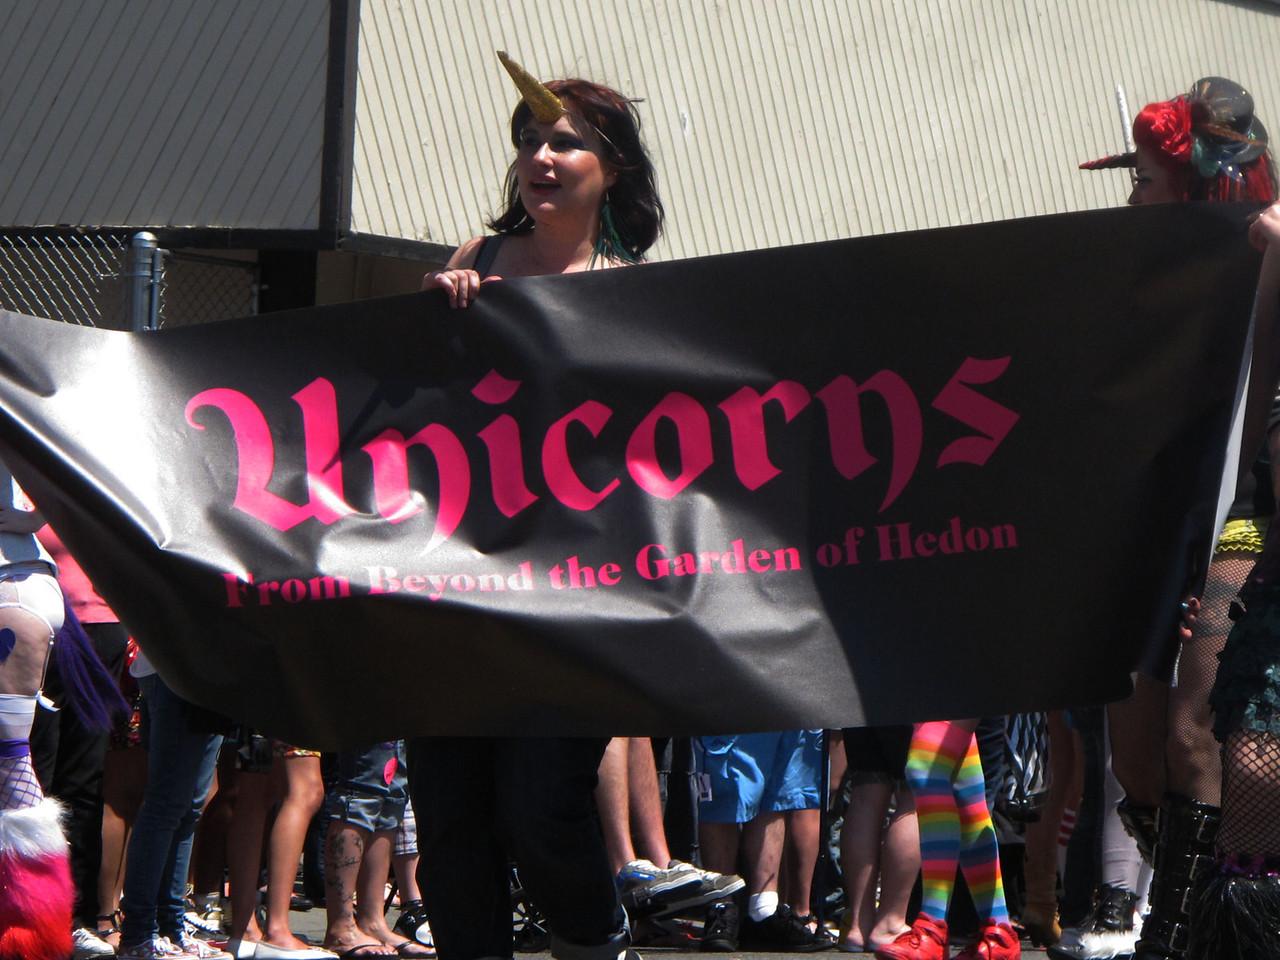 Local gay unicorn chapter?